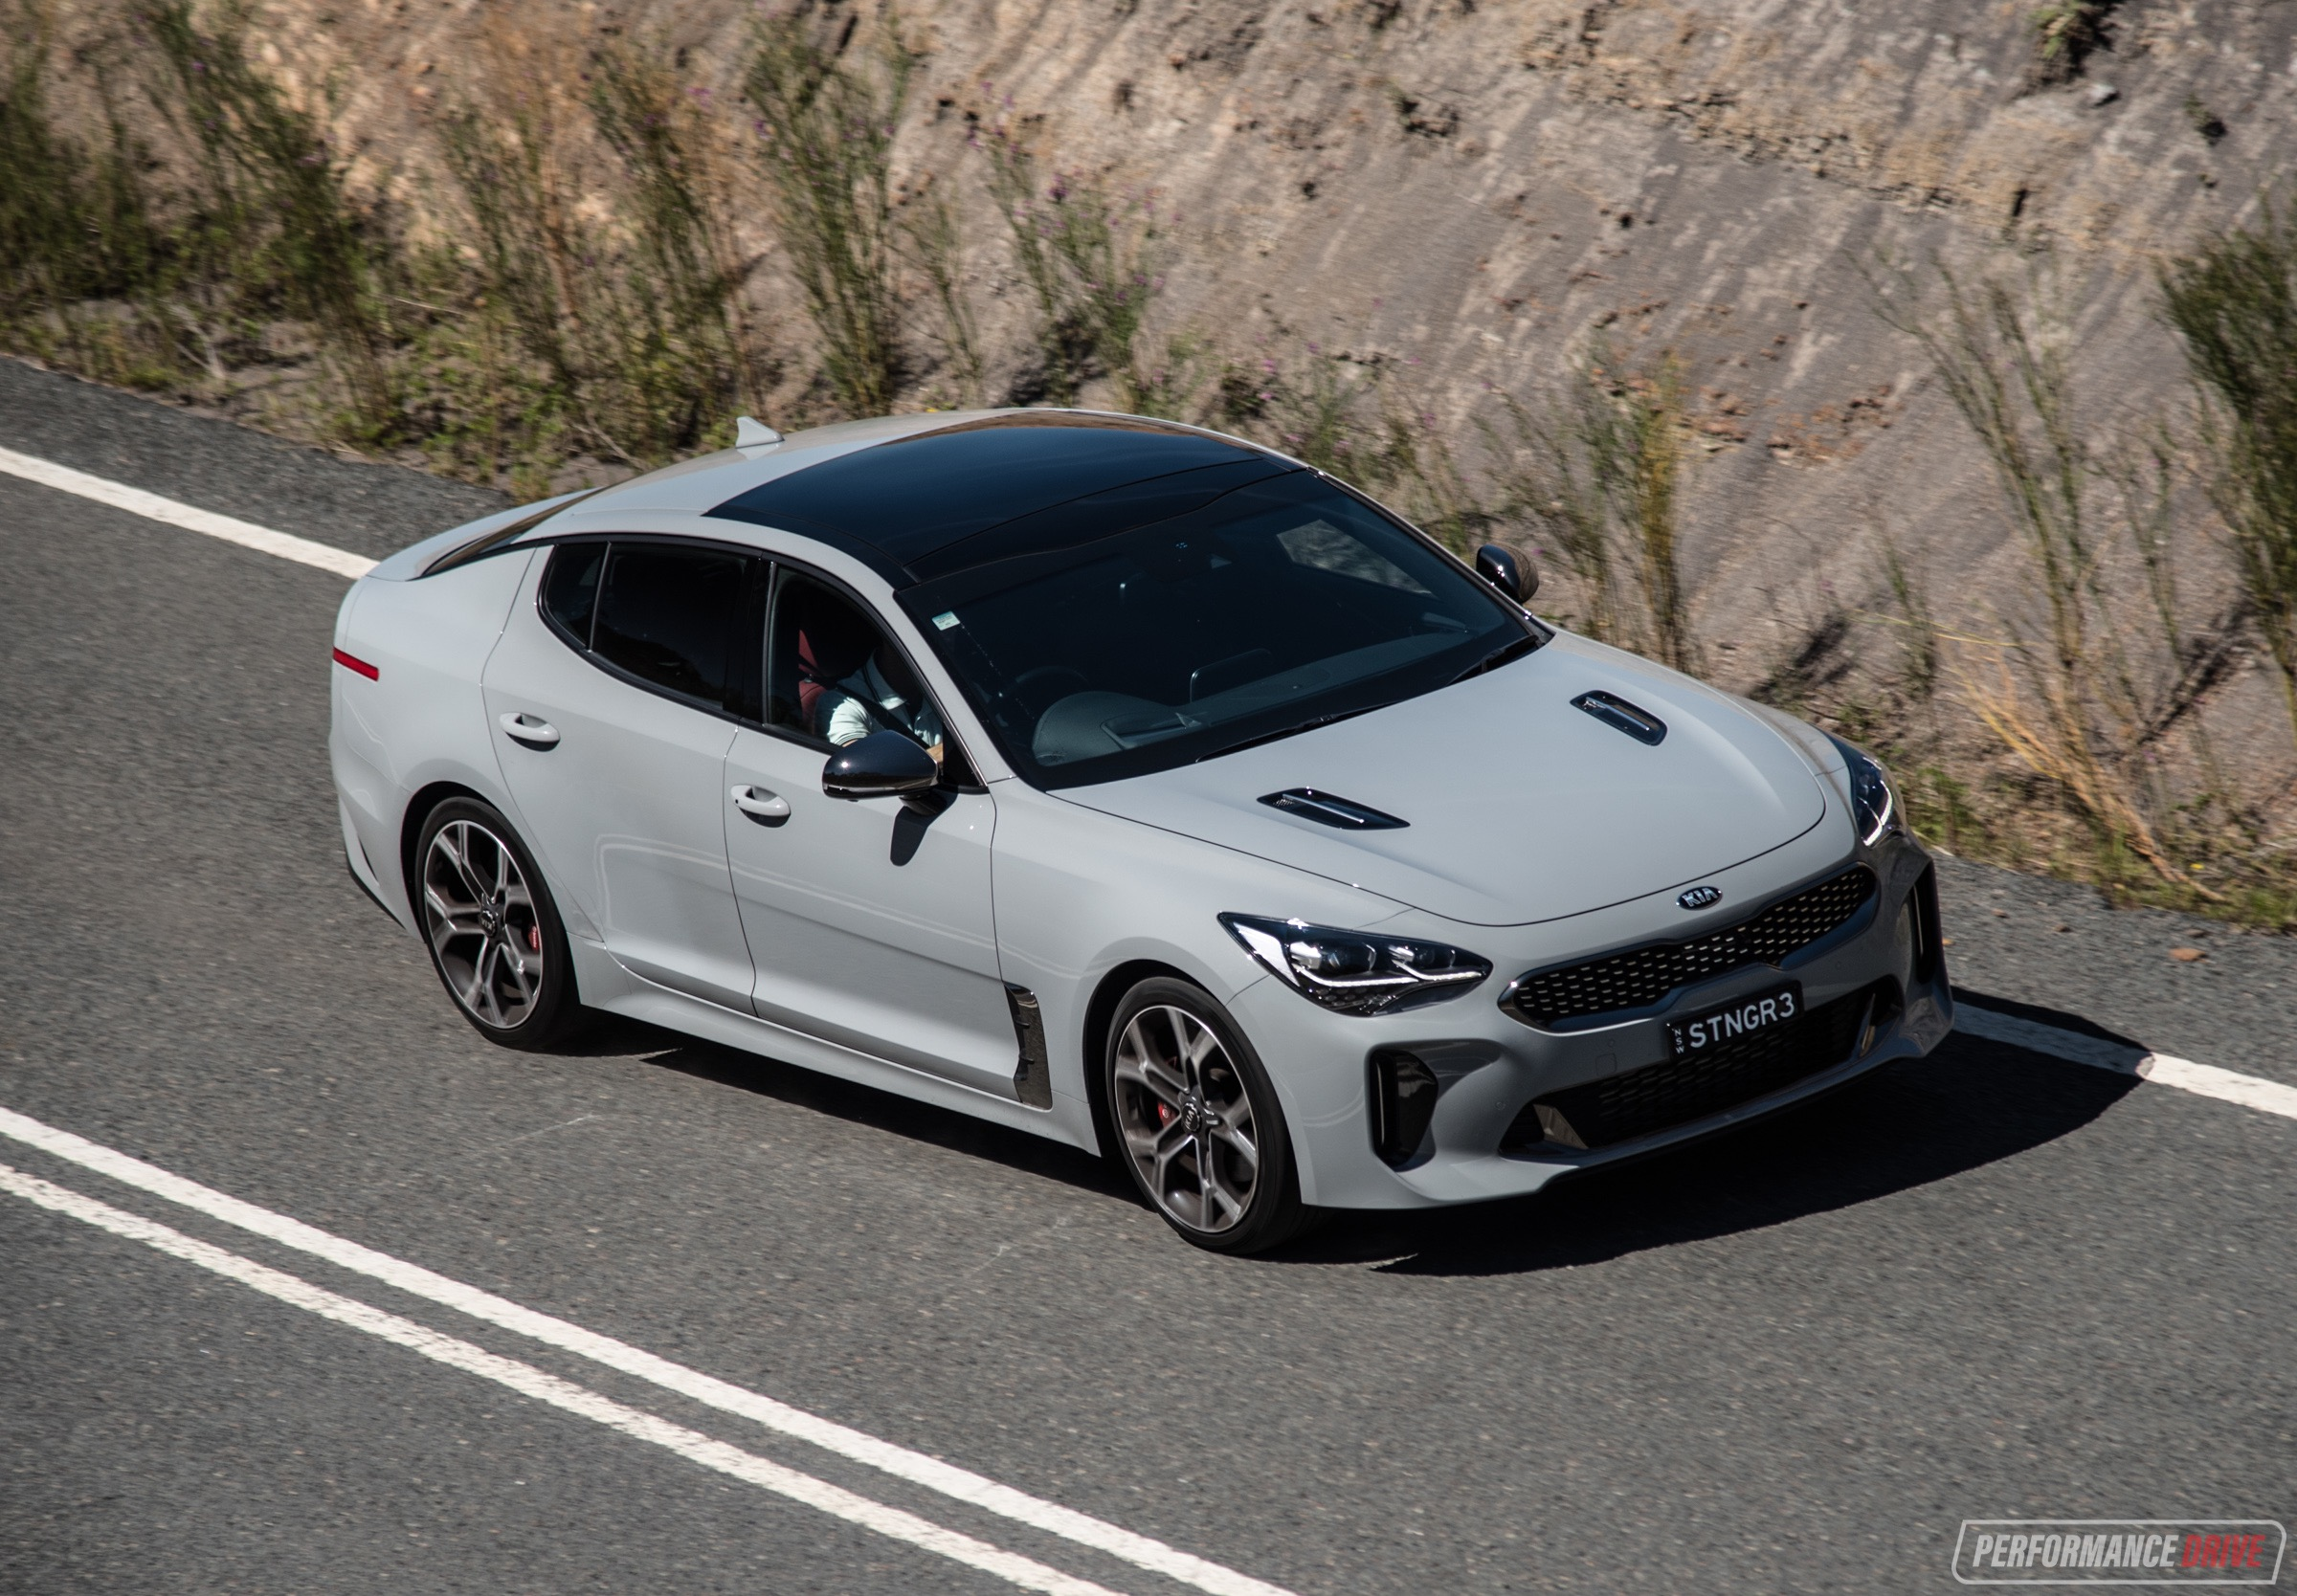 2018 Kia Stinger GT review (video) | PerformanceDrive